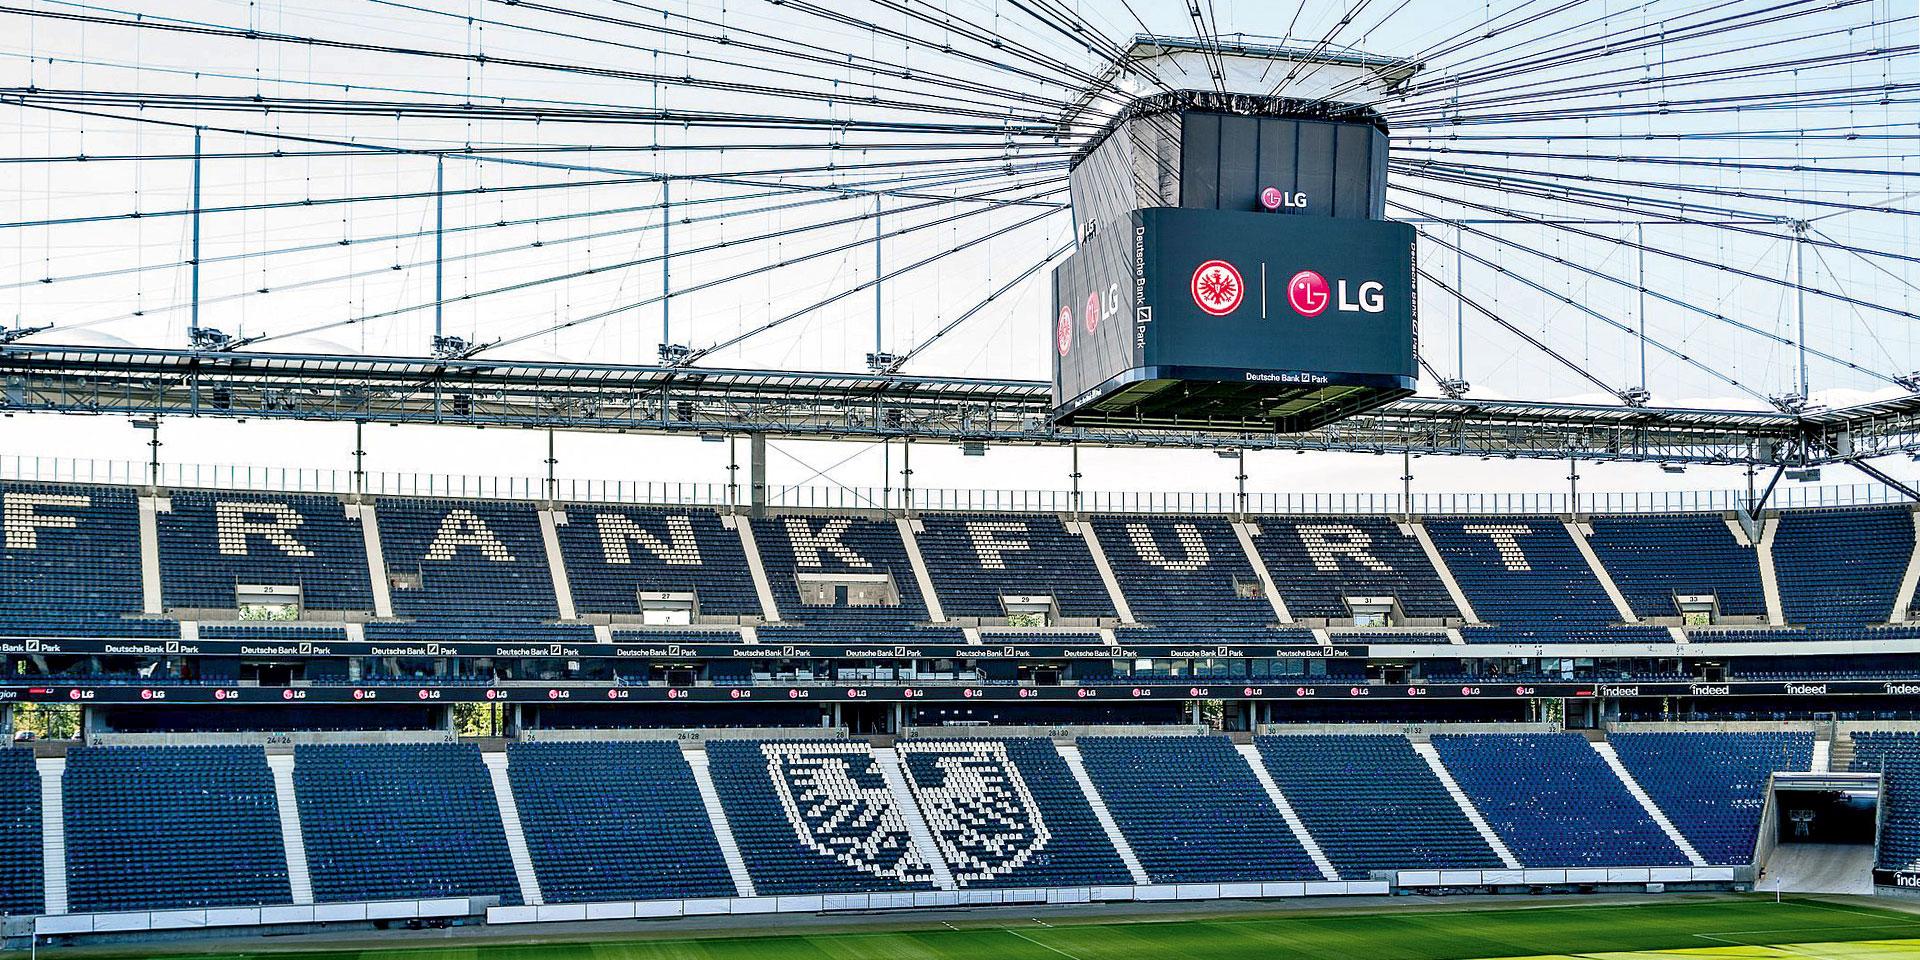 Eintracht Frankfurt LG Electronics display